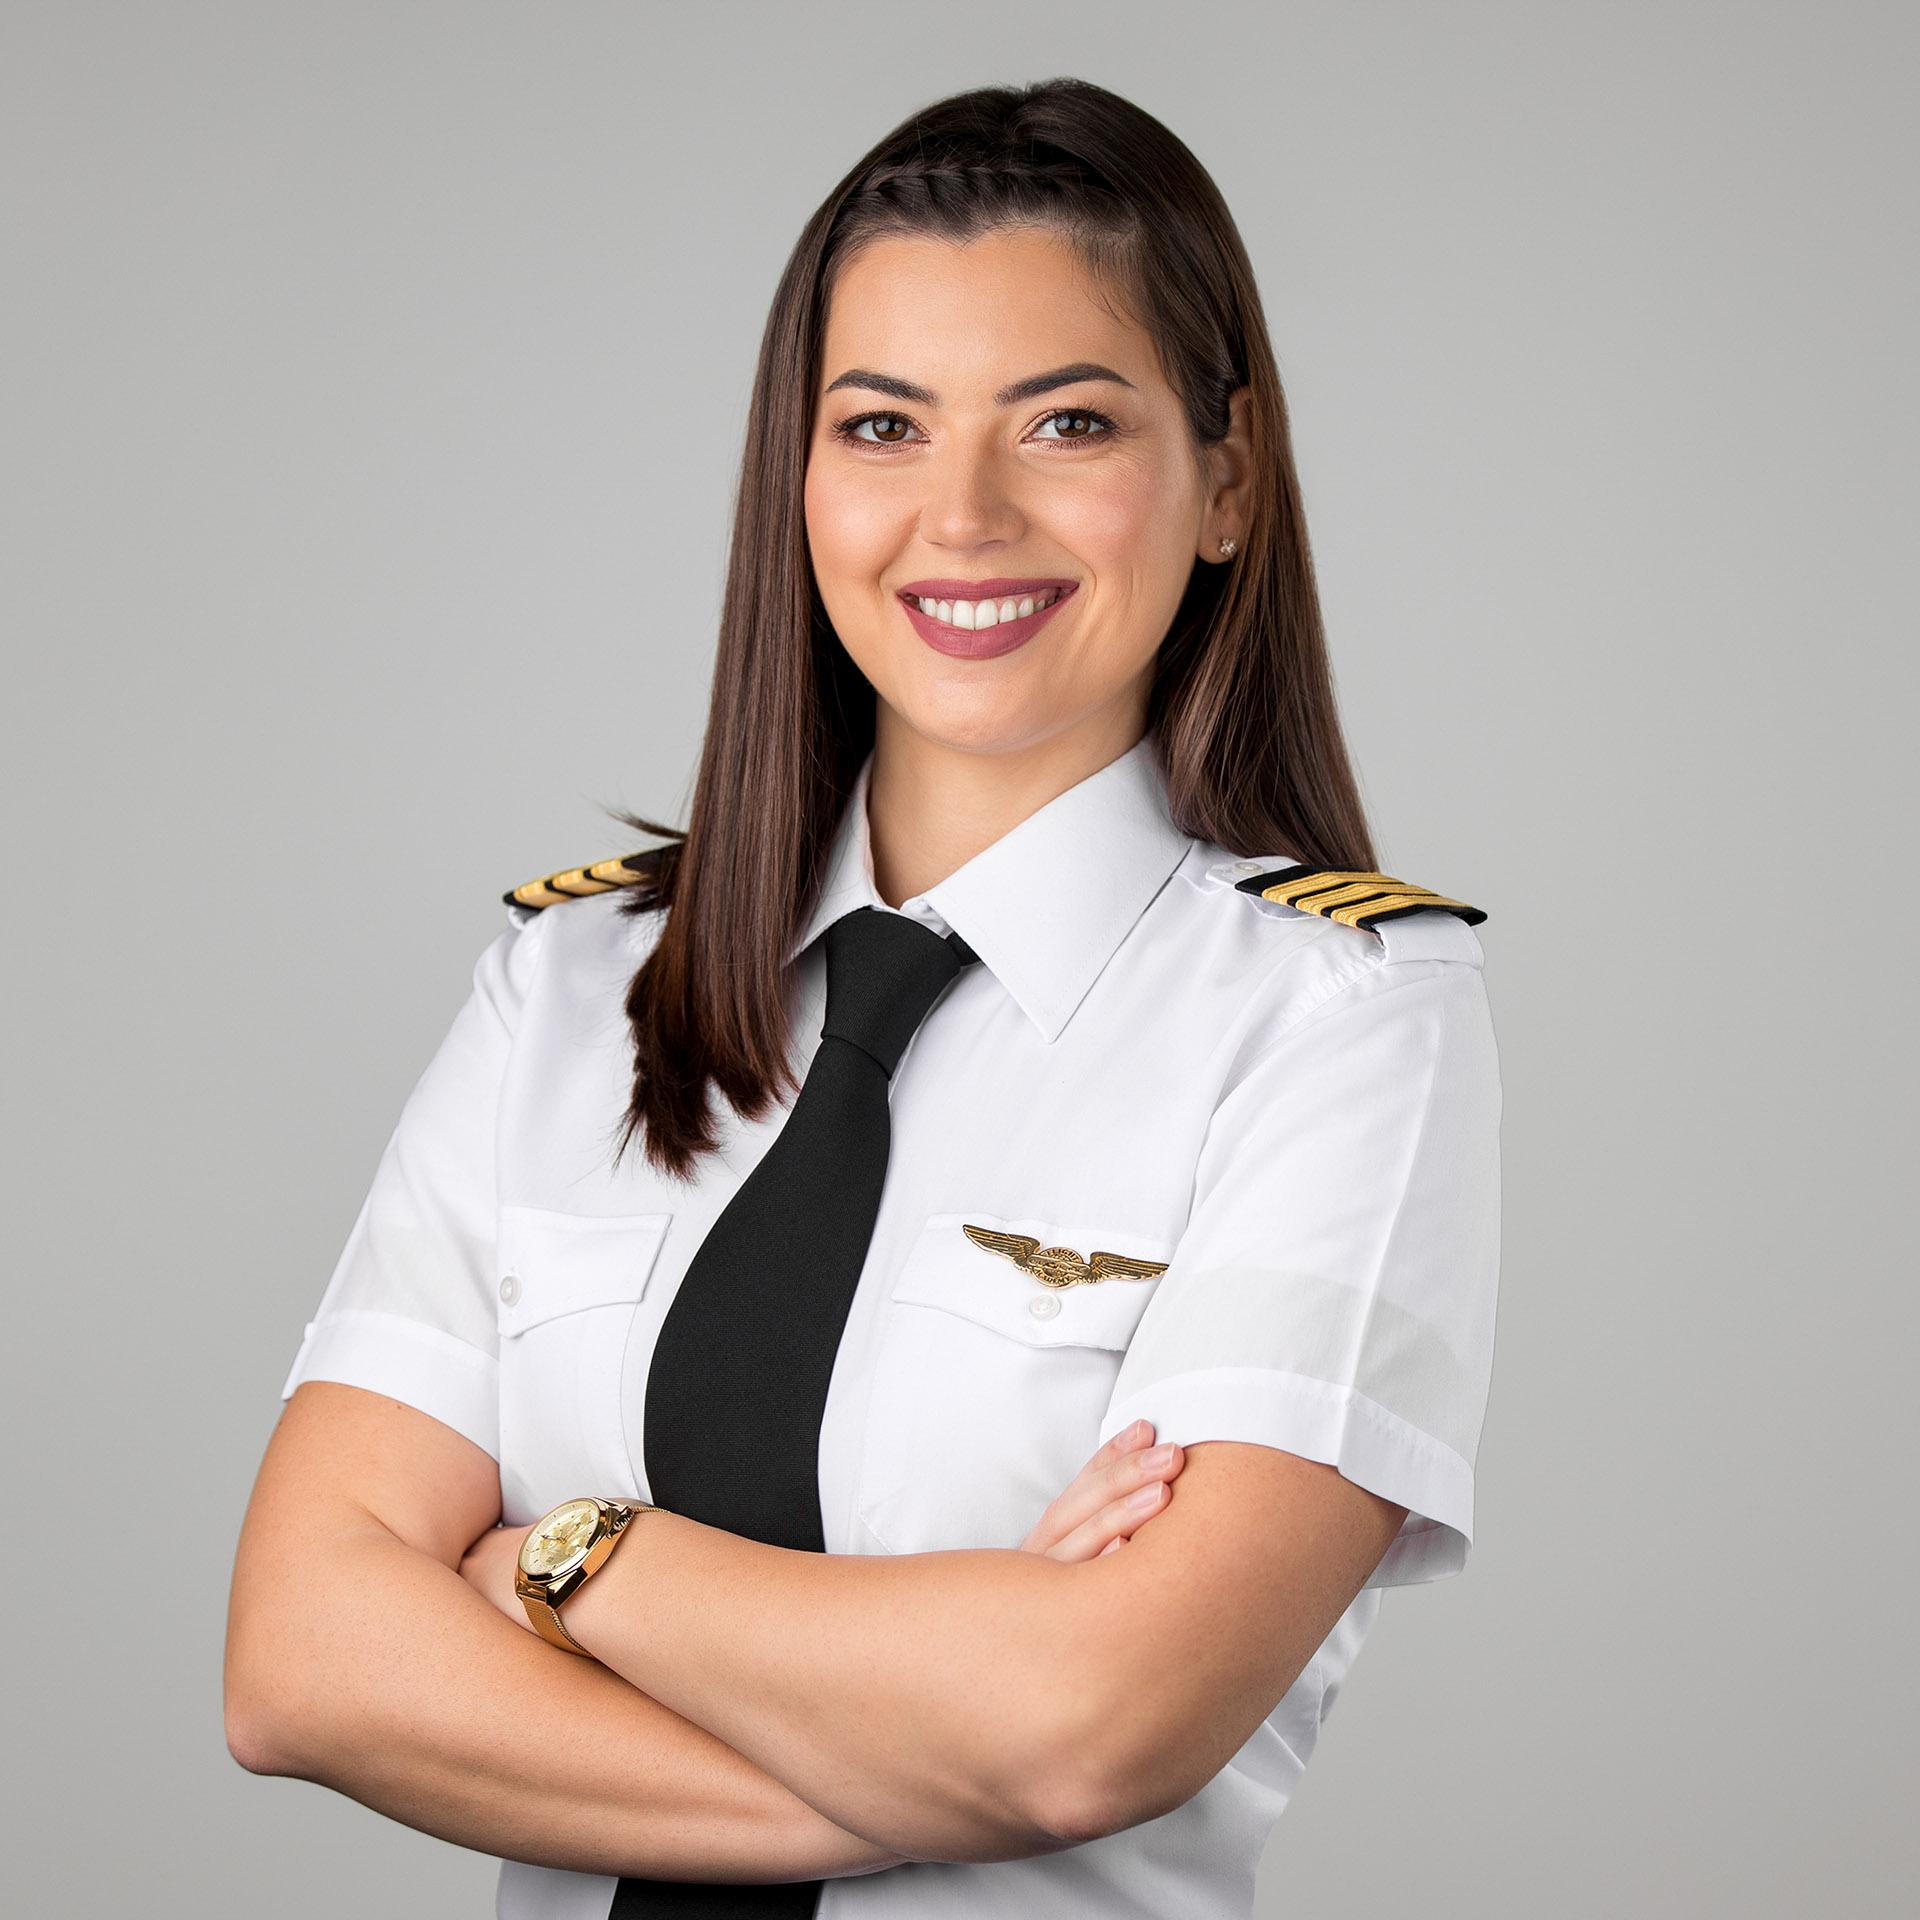 ivana-tadic-poslovni-portret-zenski-pilot